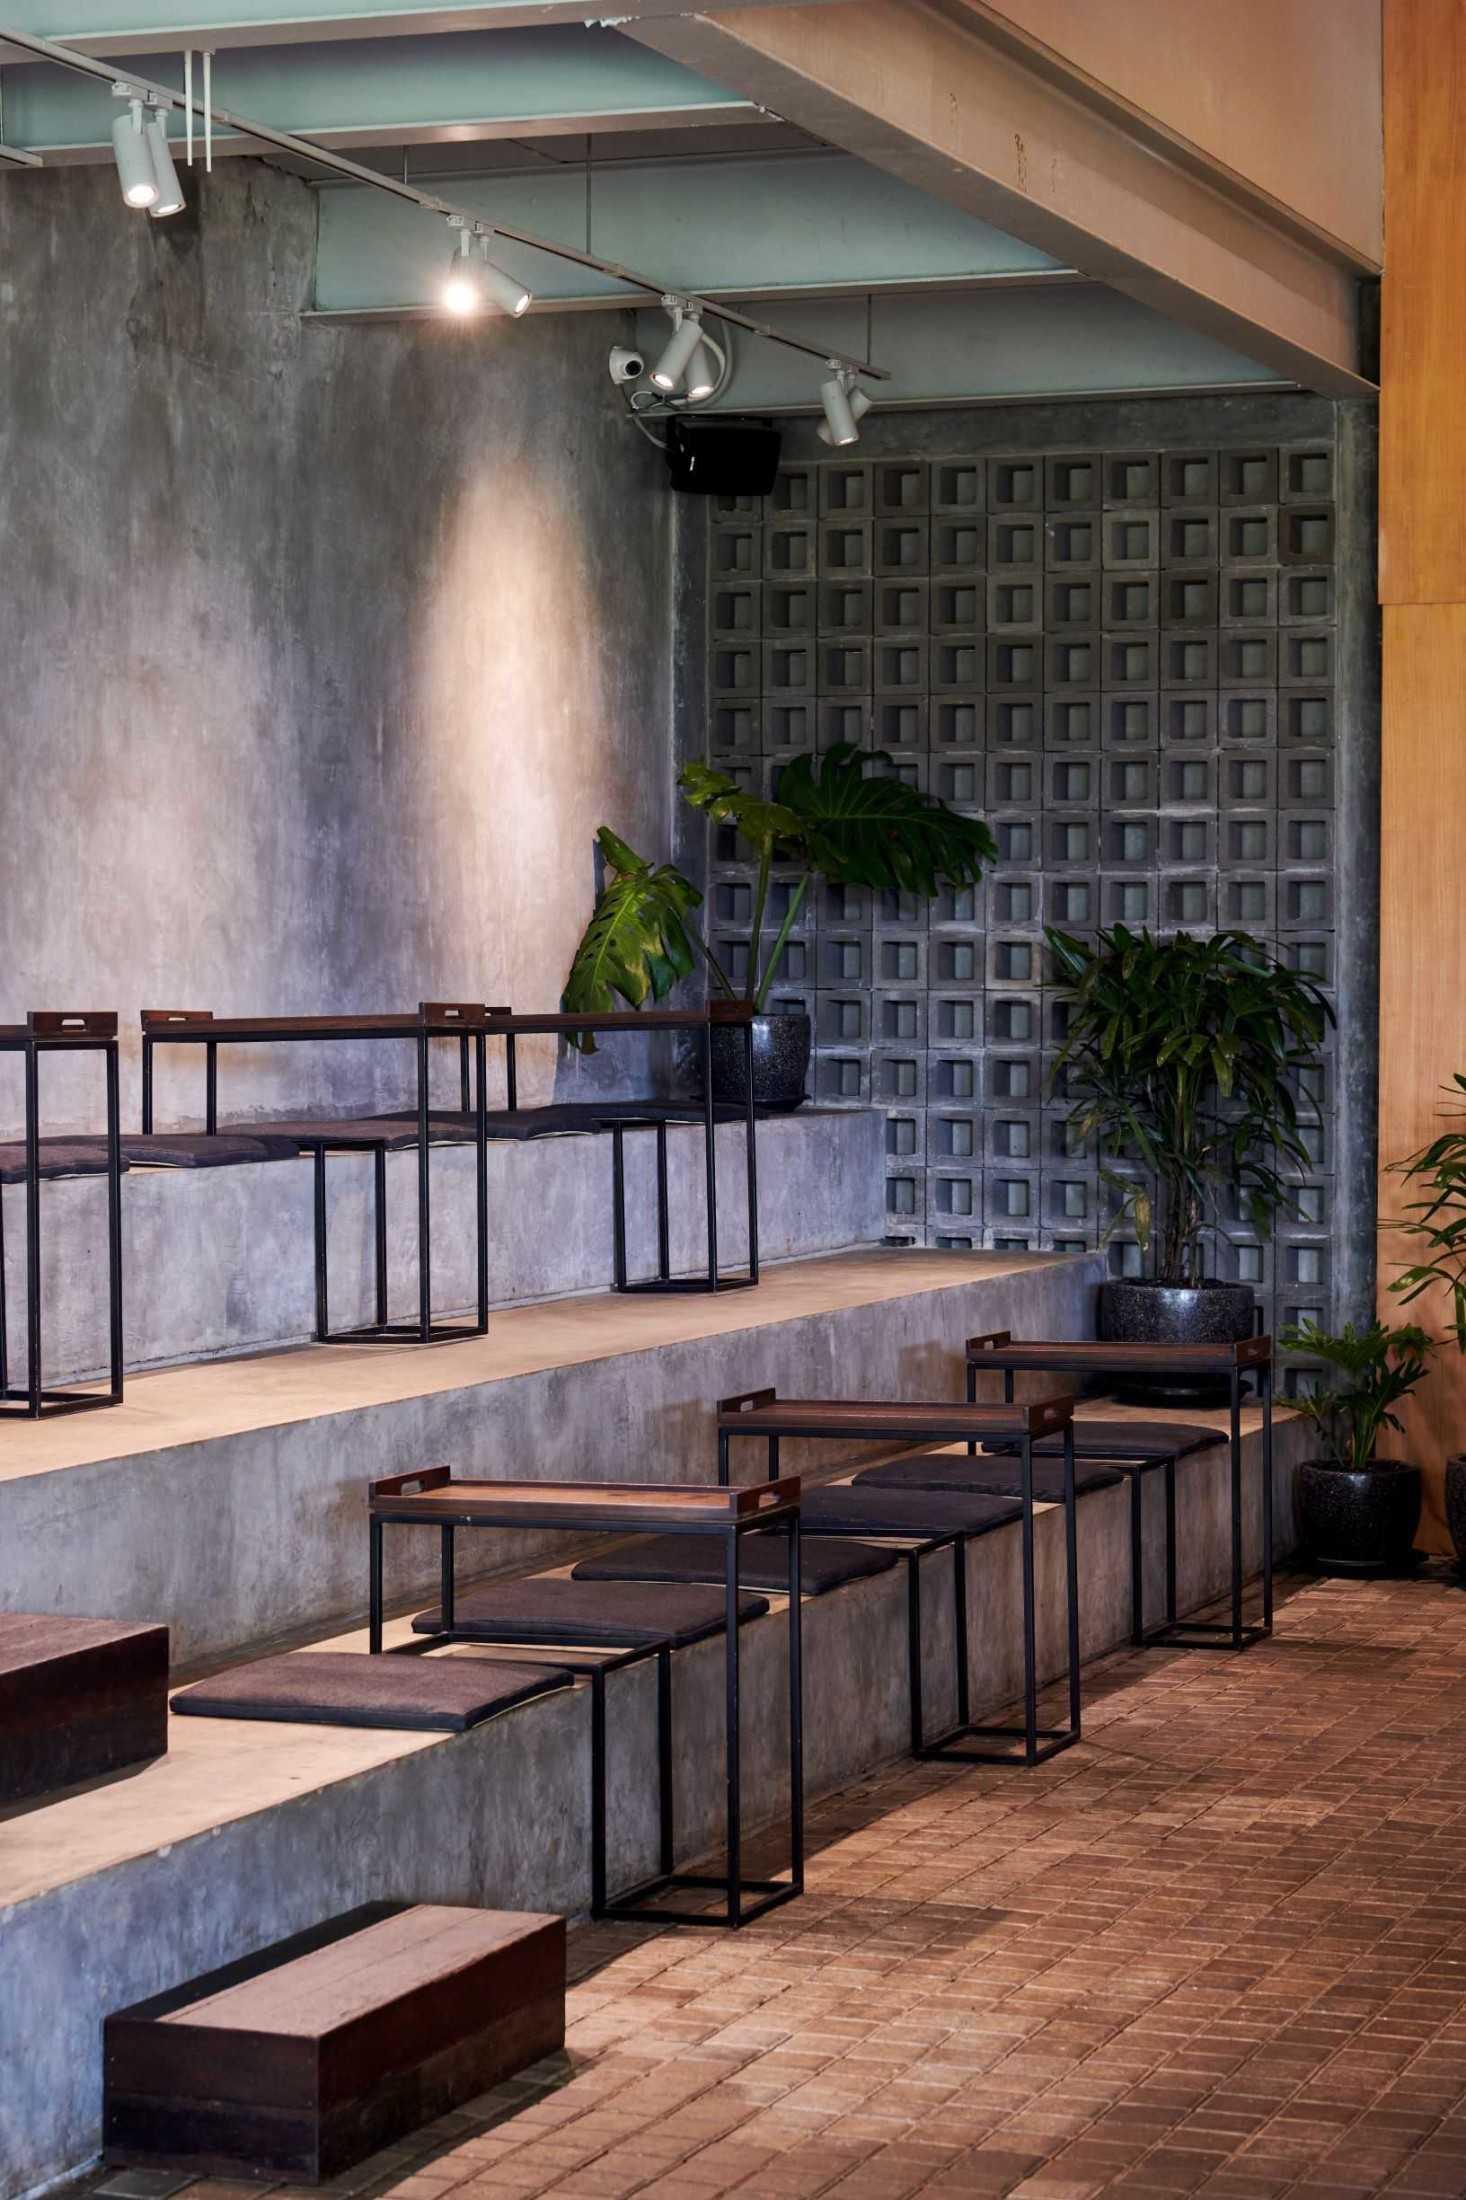 Hadivincent Architects Oval Bar Ciumbuleuit, Cidadap, Kota Bandung, Jawa Barat, Indonesia Ciumbuleuit, Cidadap, Kota Bandung, Jawa Barat, Indonesia Hadivincent-Architects-Oval-Bar  71521